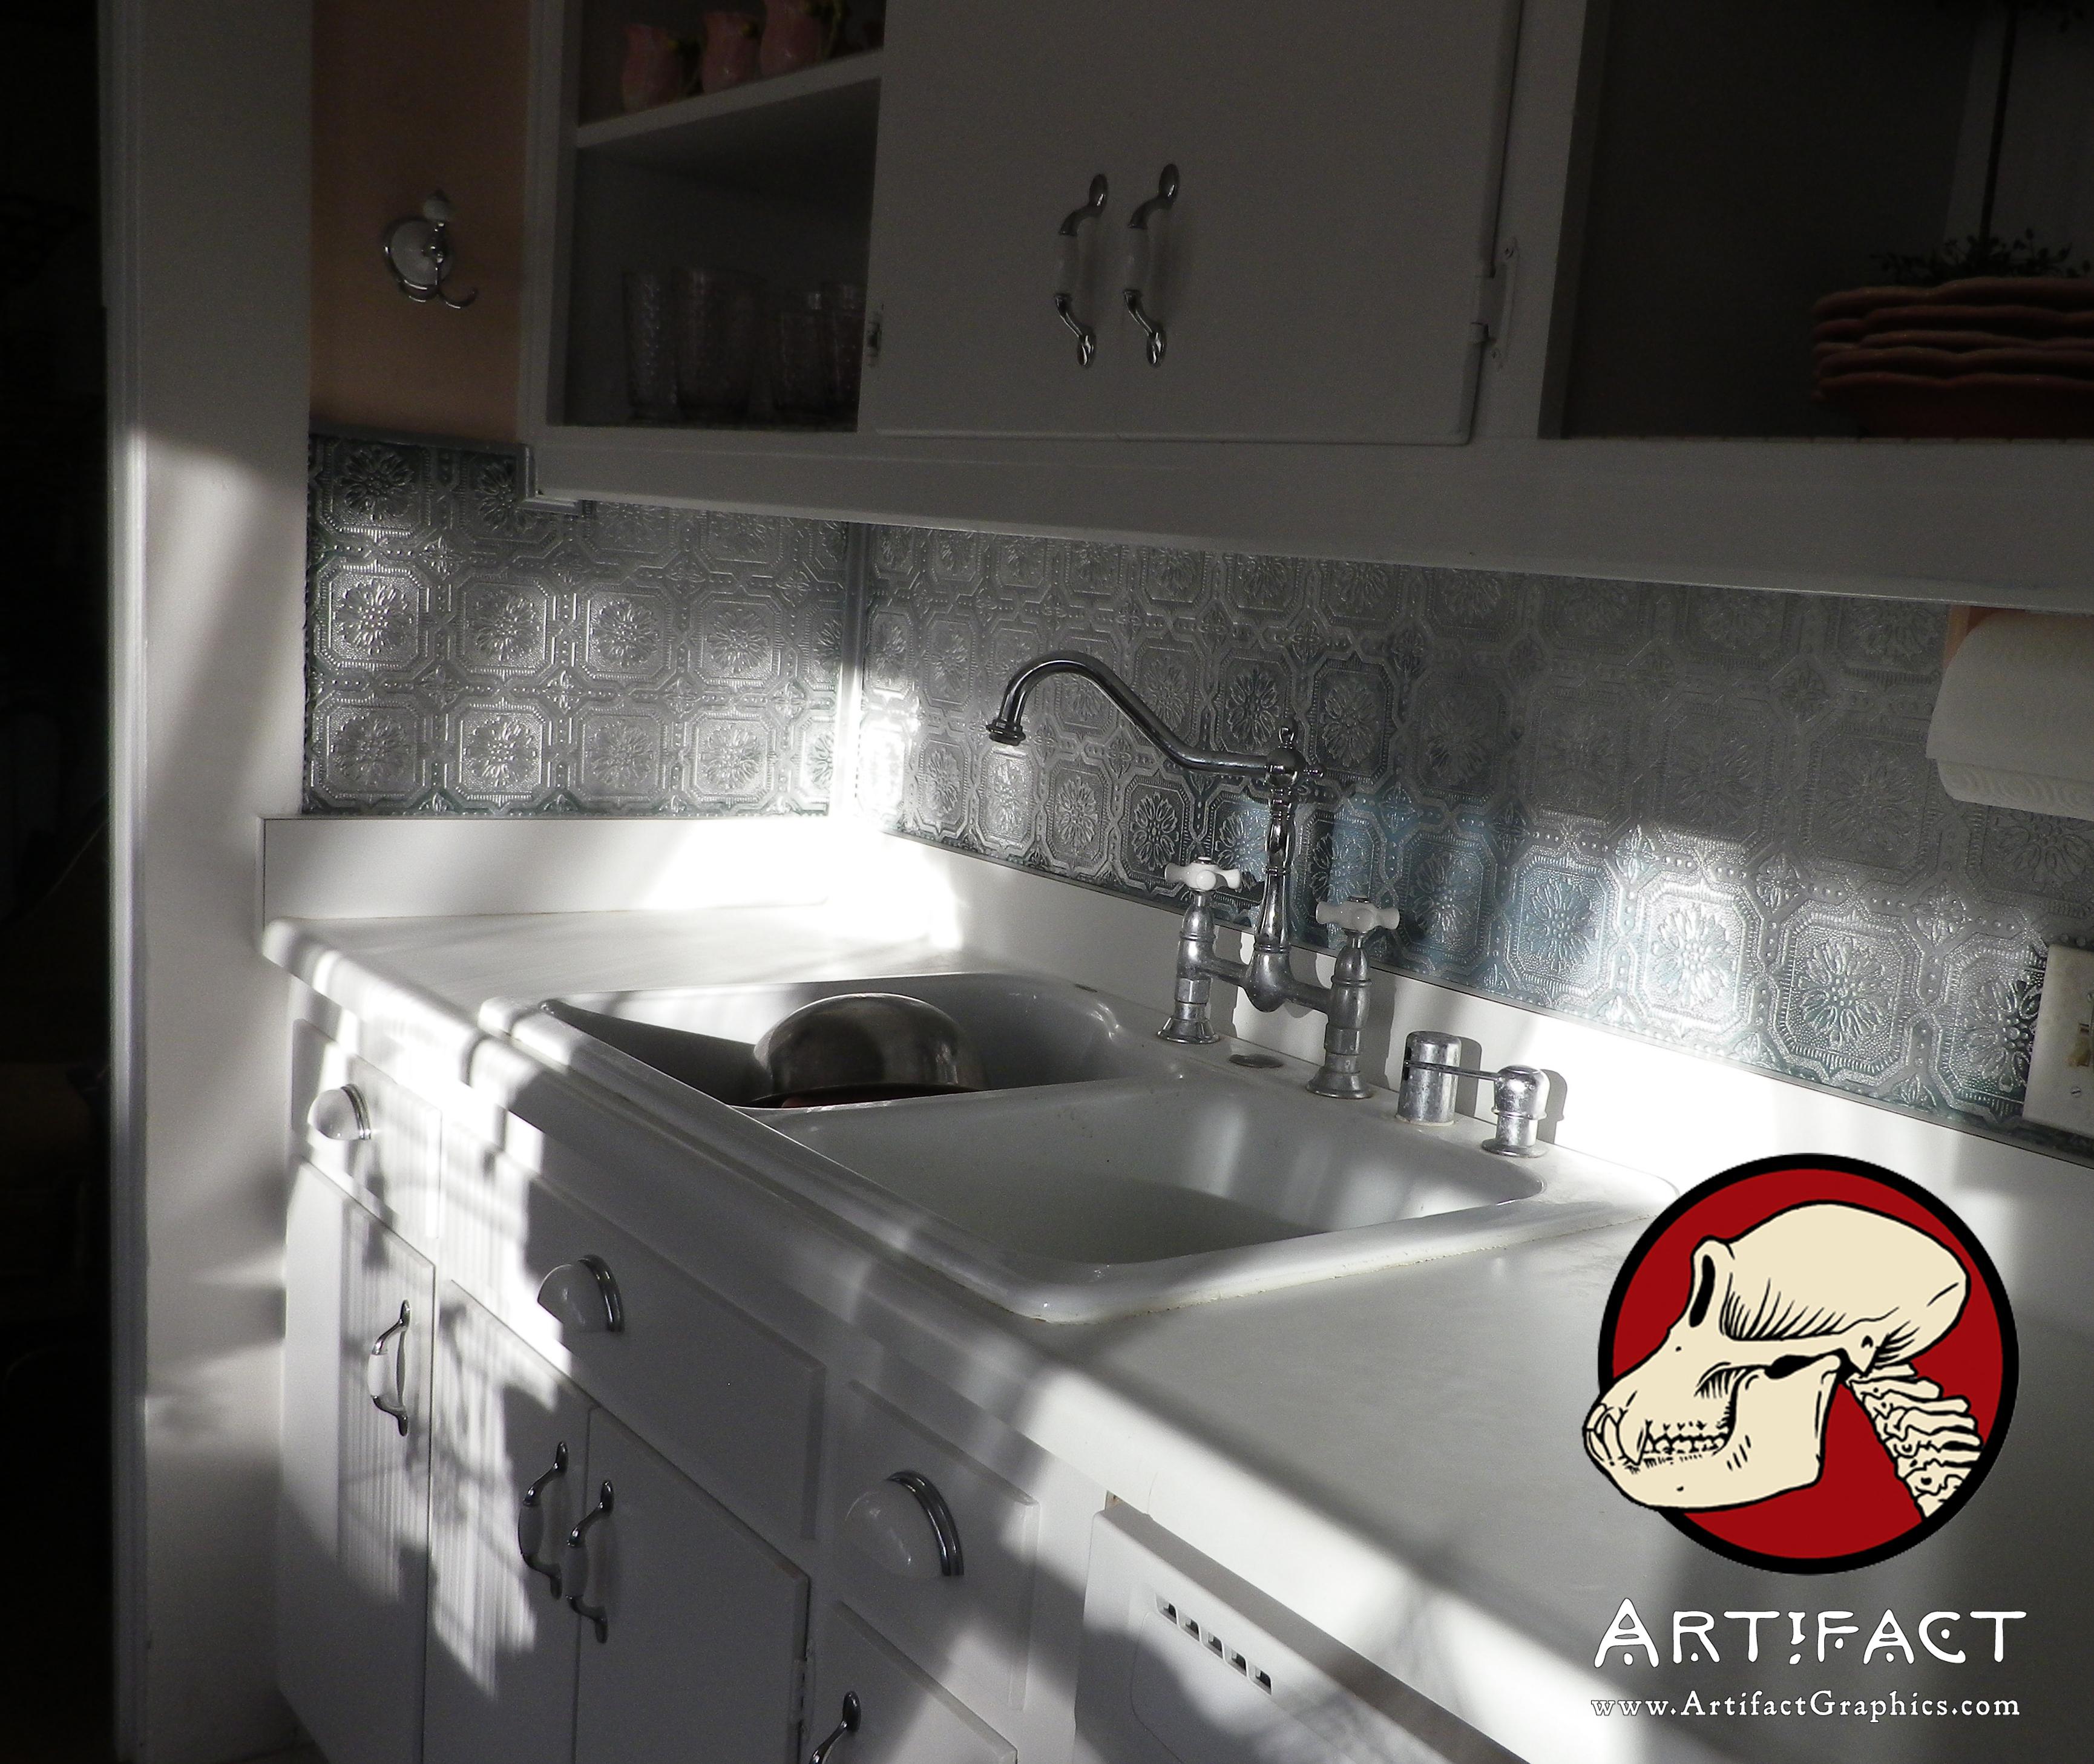 Wallpaper As Backsplash: Tile Backsplash Over Wallpaper